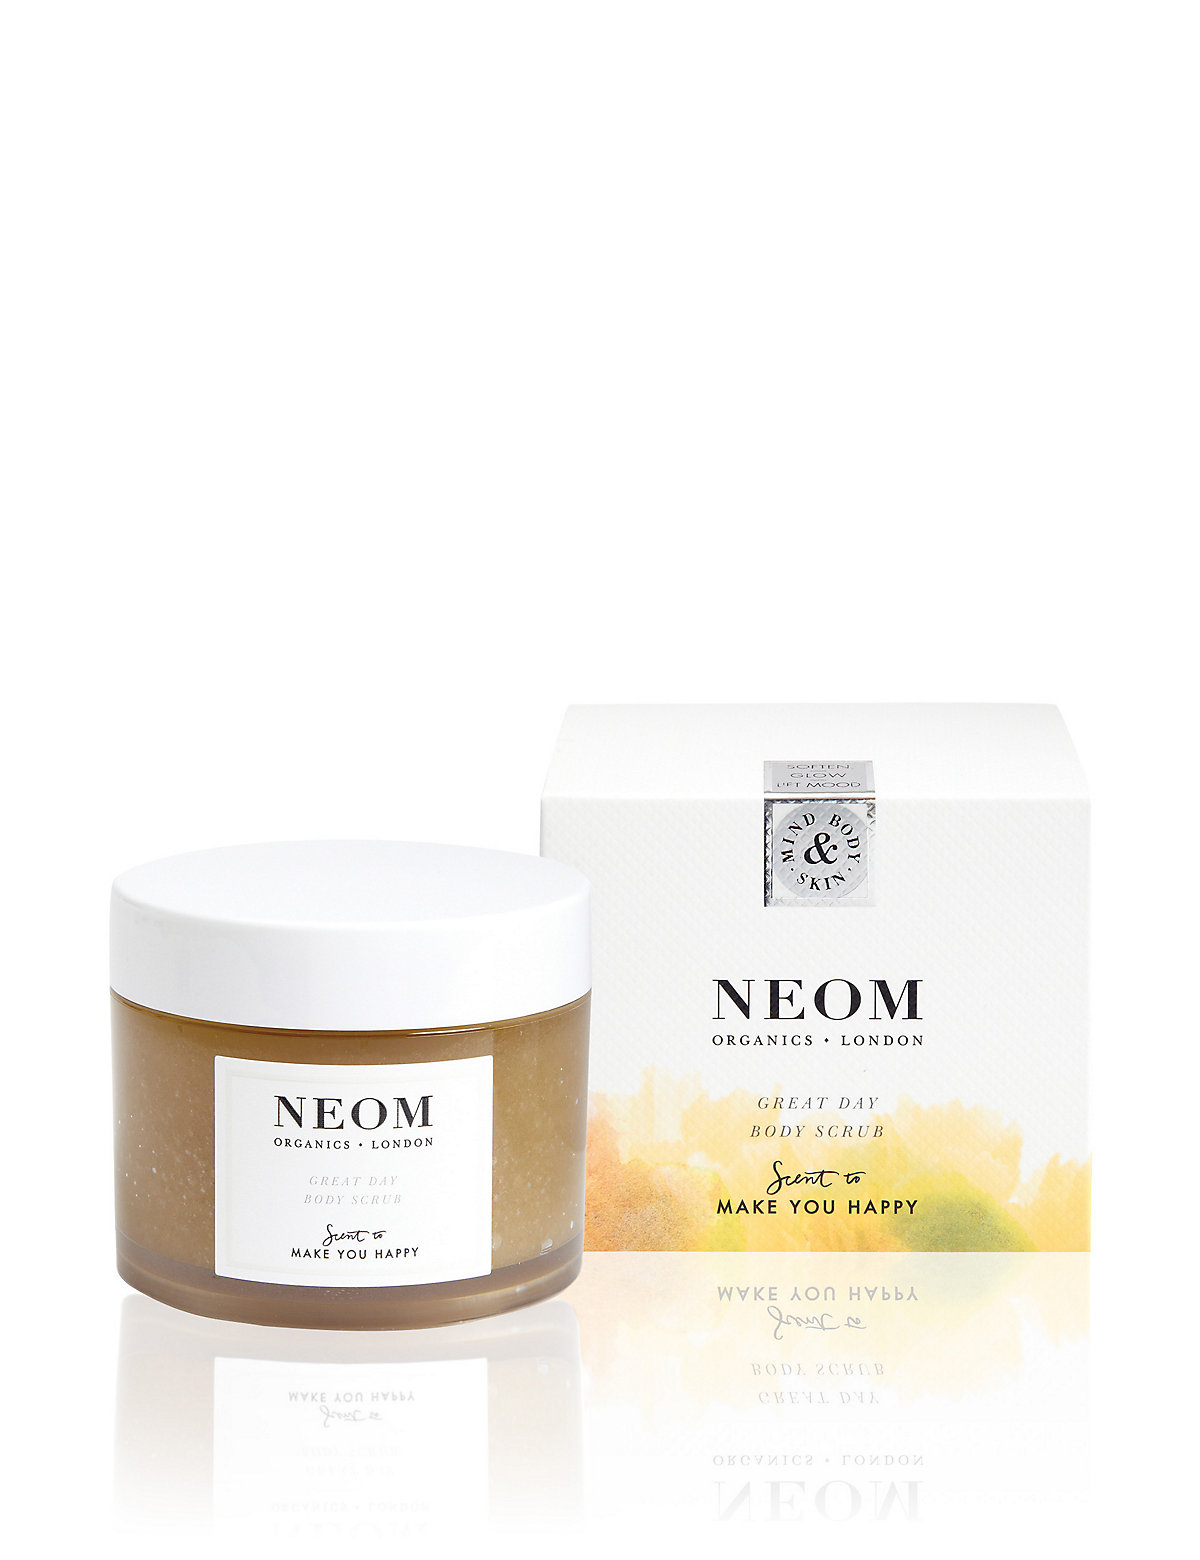 Neom Great Day Body Scrub 332g